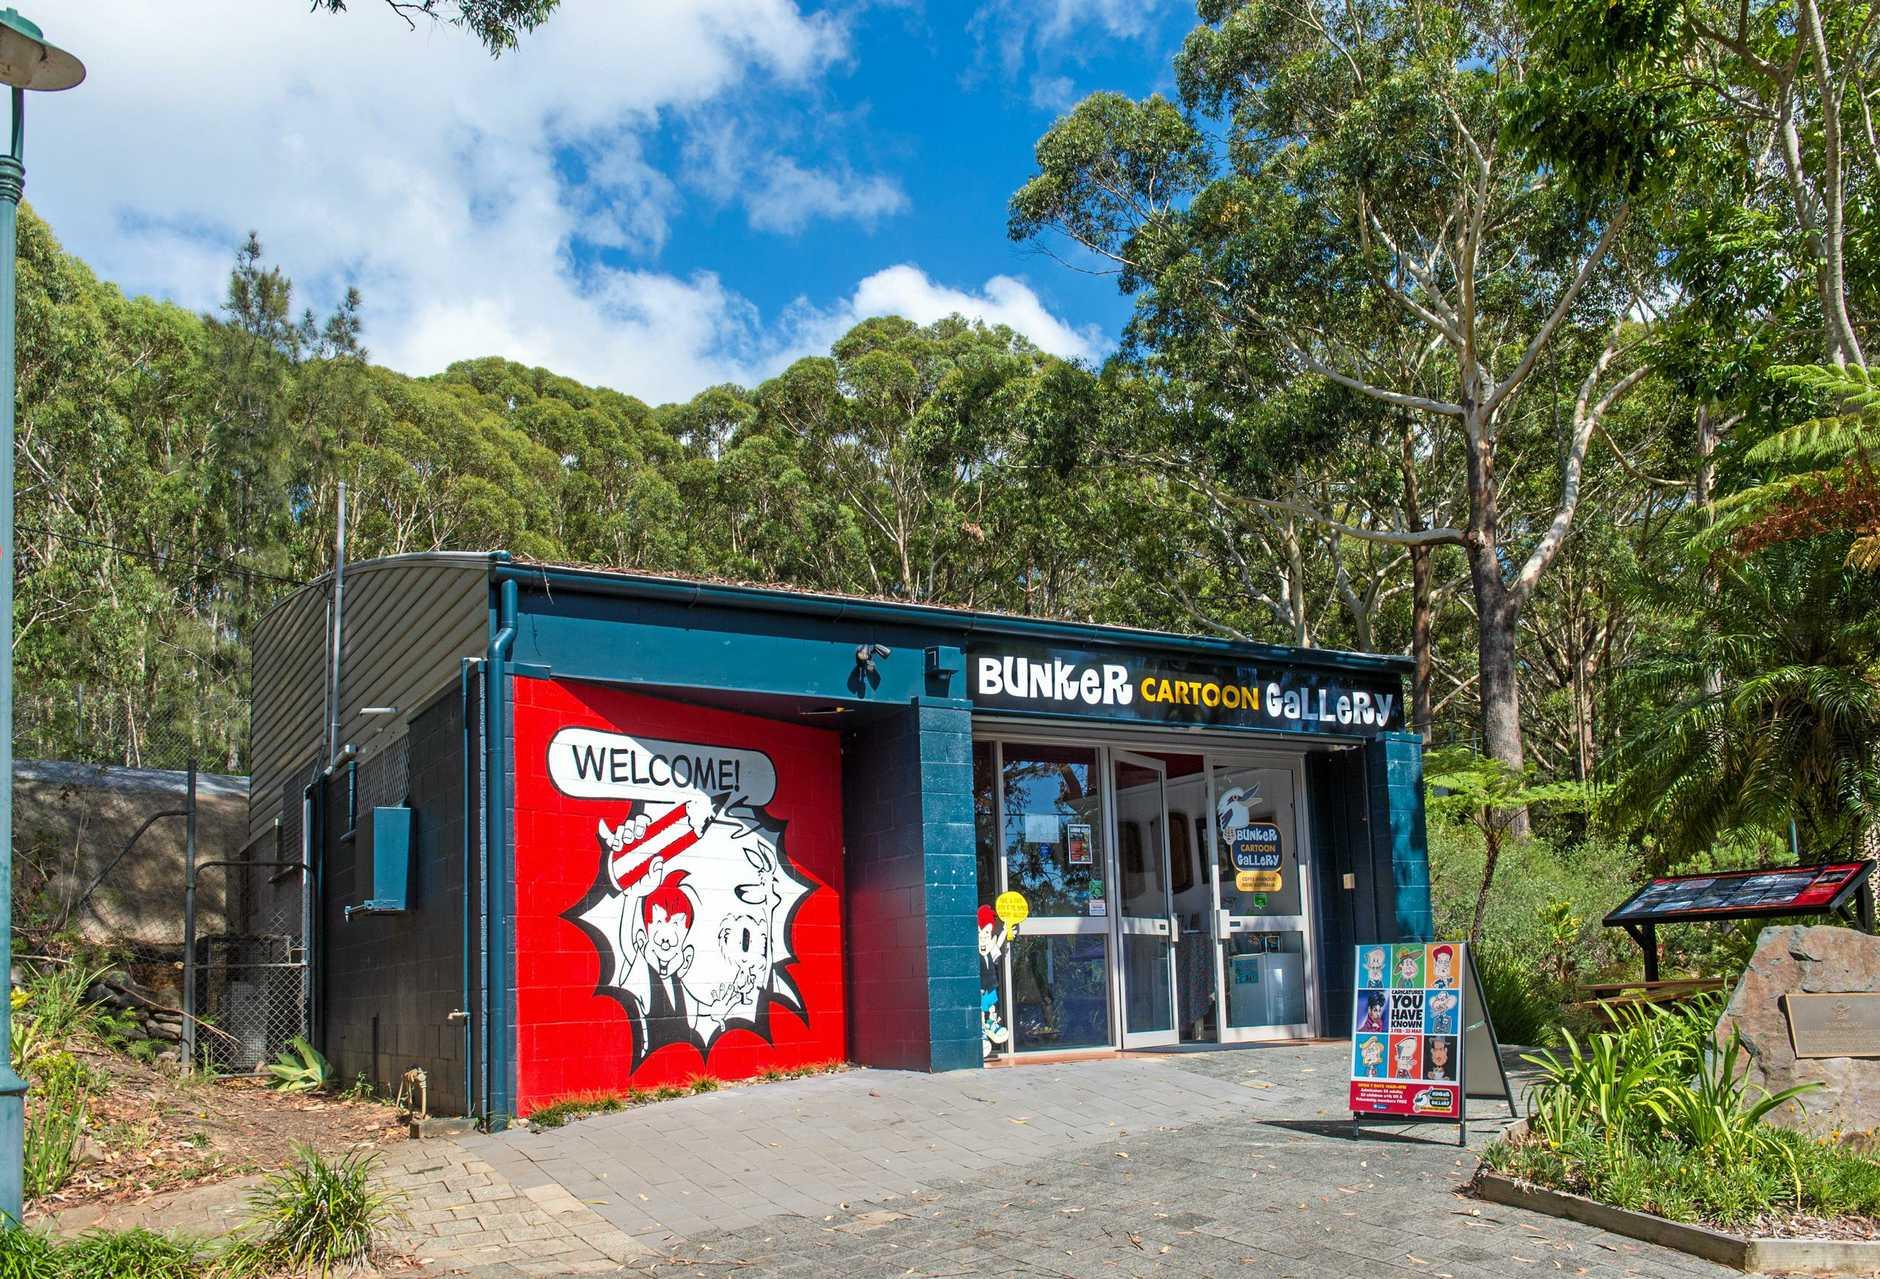 Bunker cartoon gallery. 30 January 2018